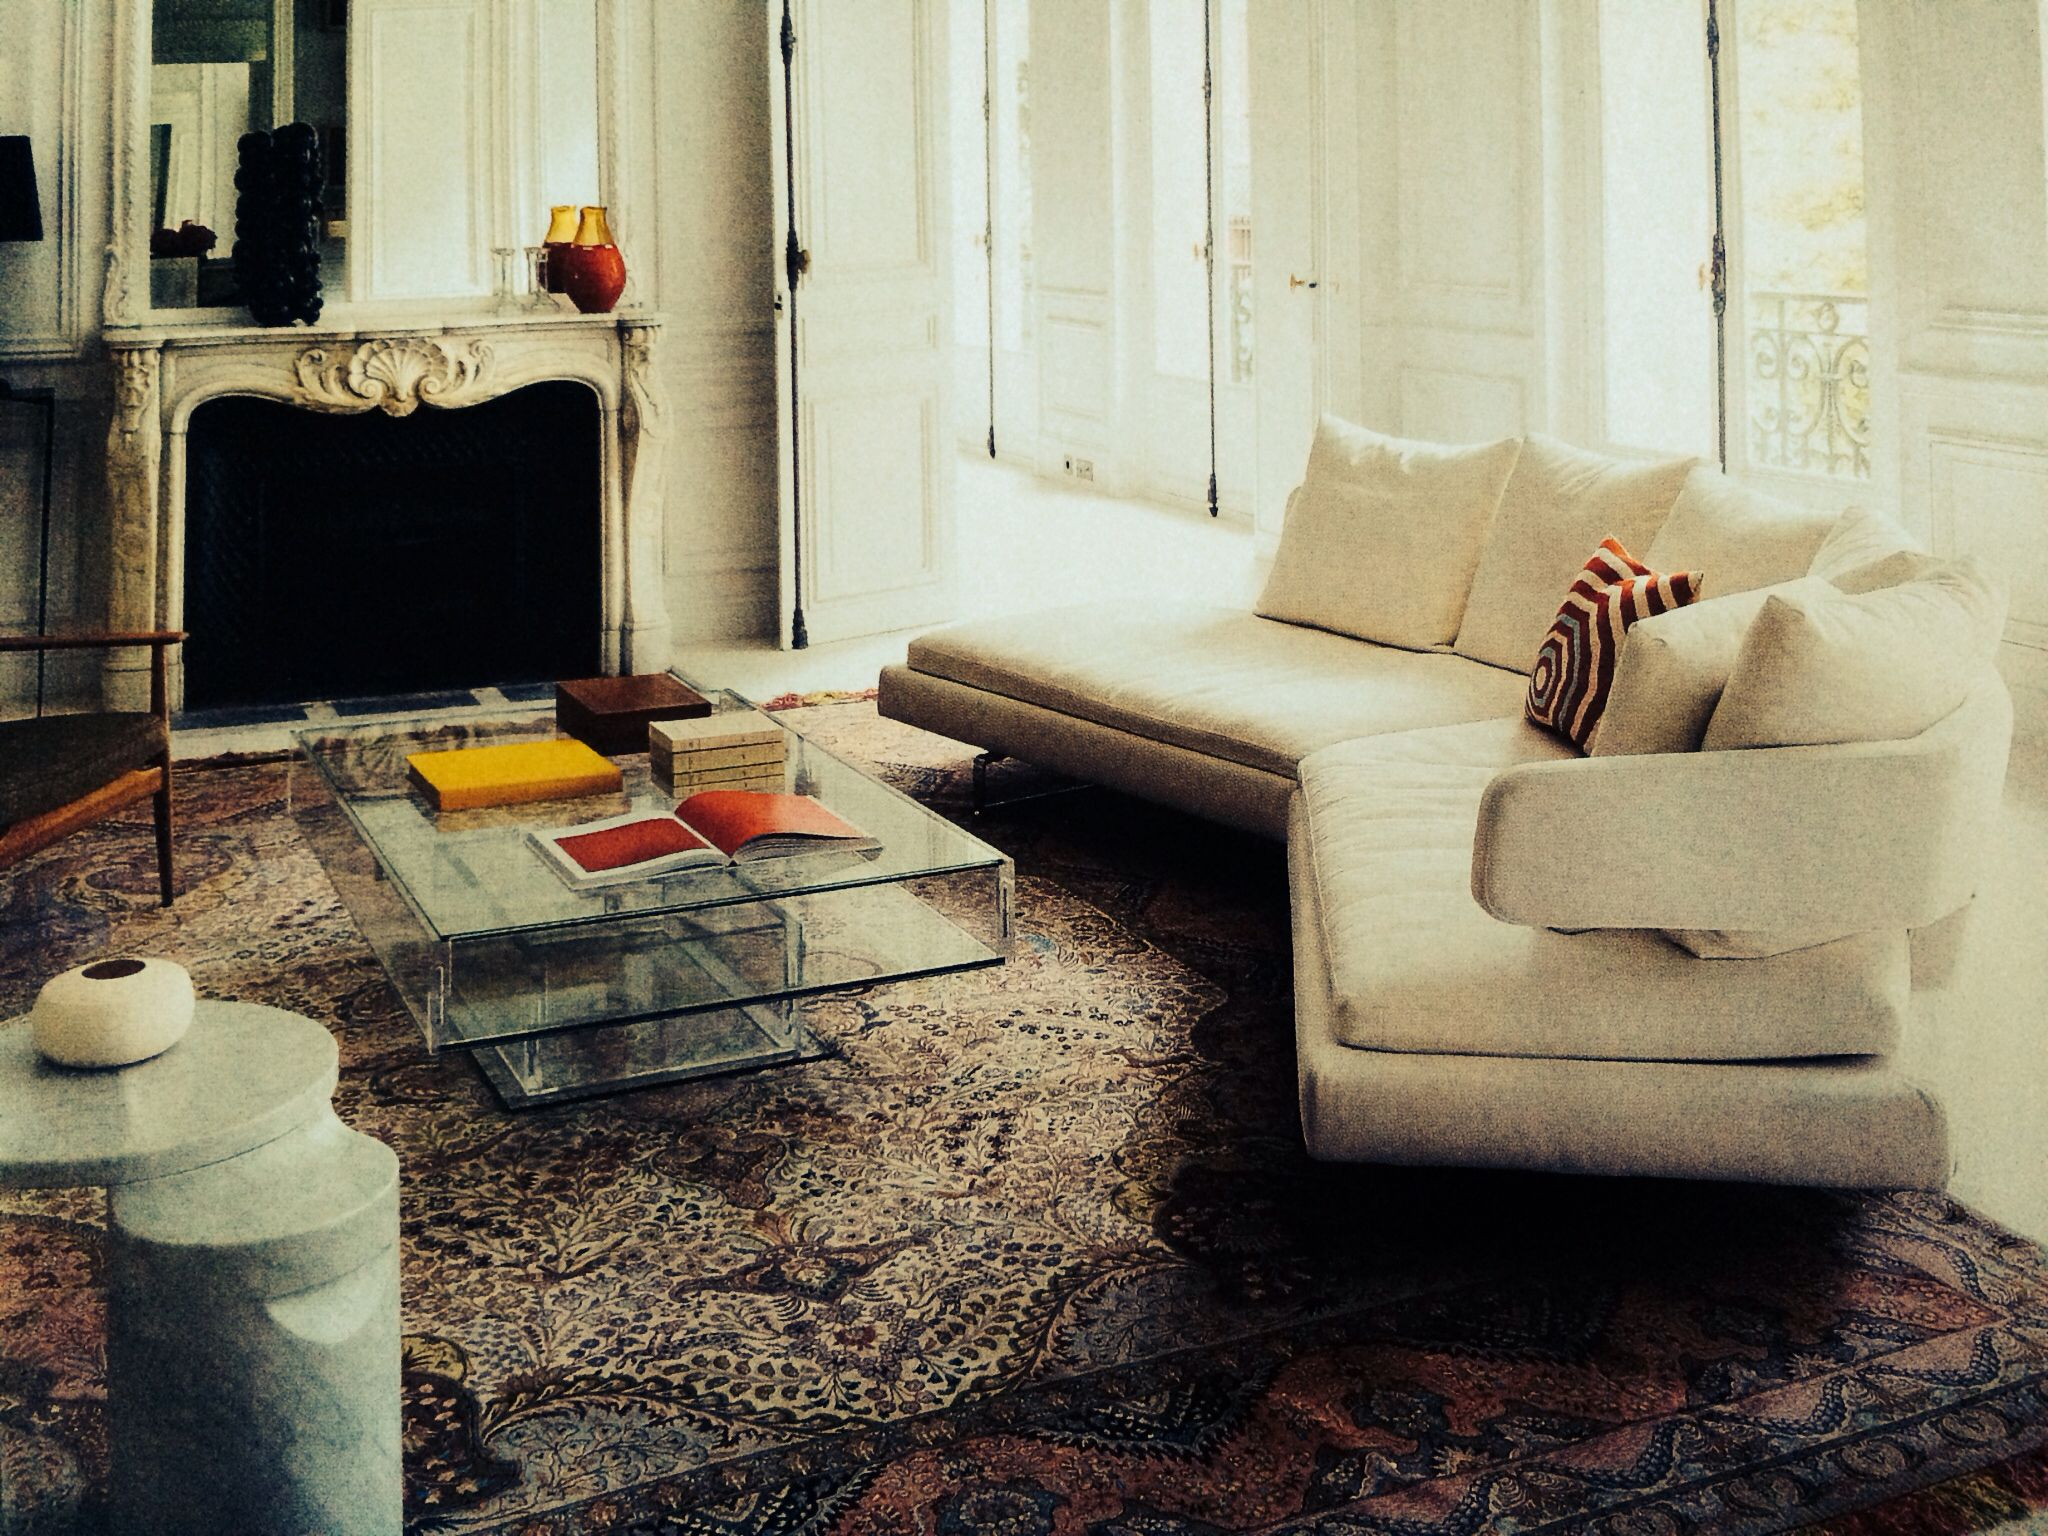 Arne sofa by Antonio Citterio B&B Italia pj